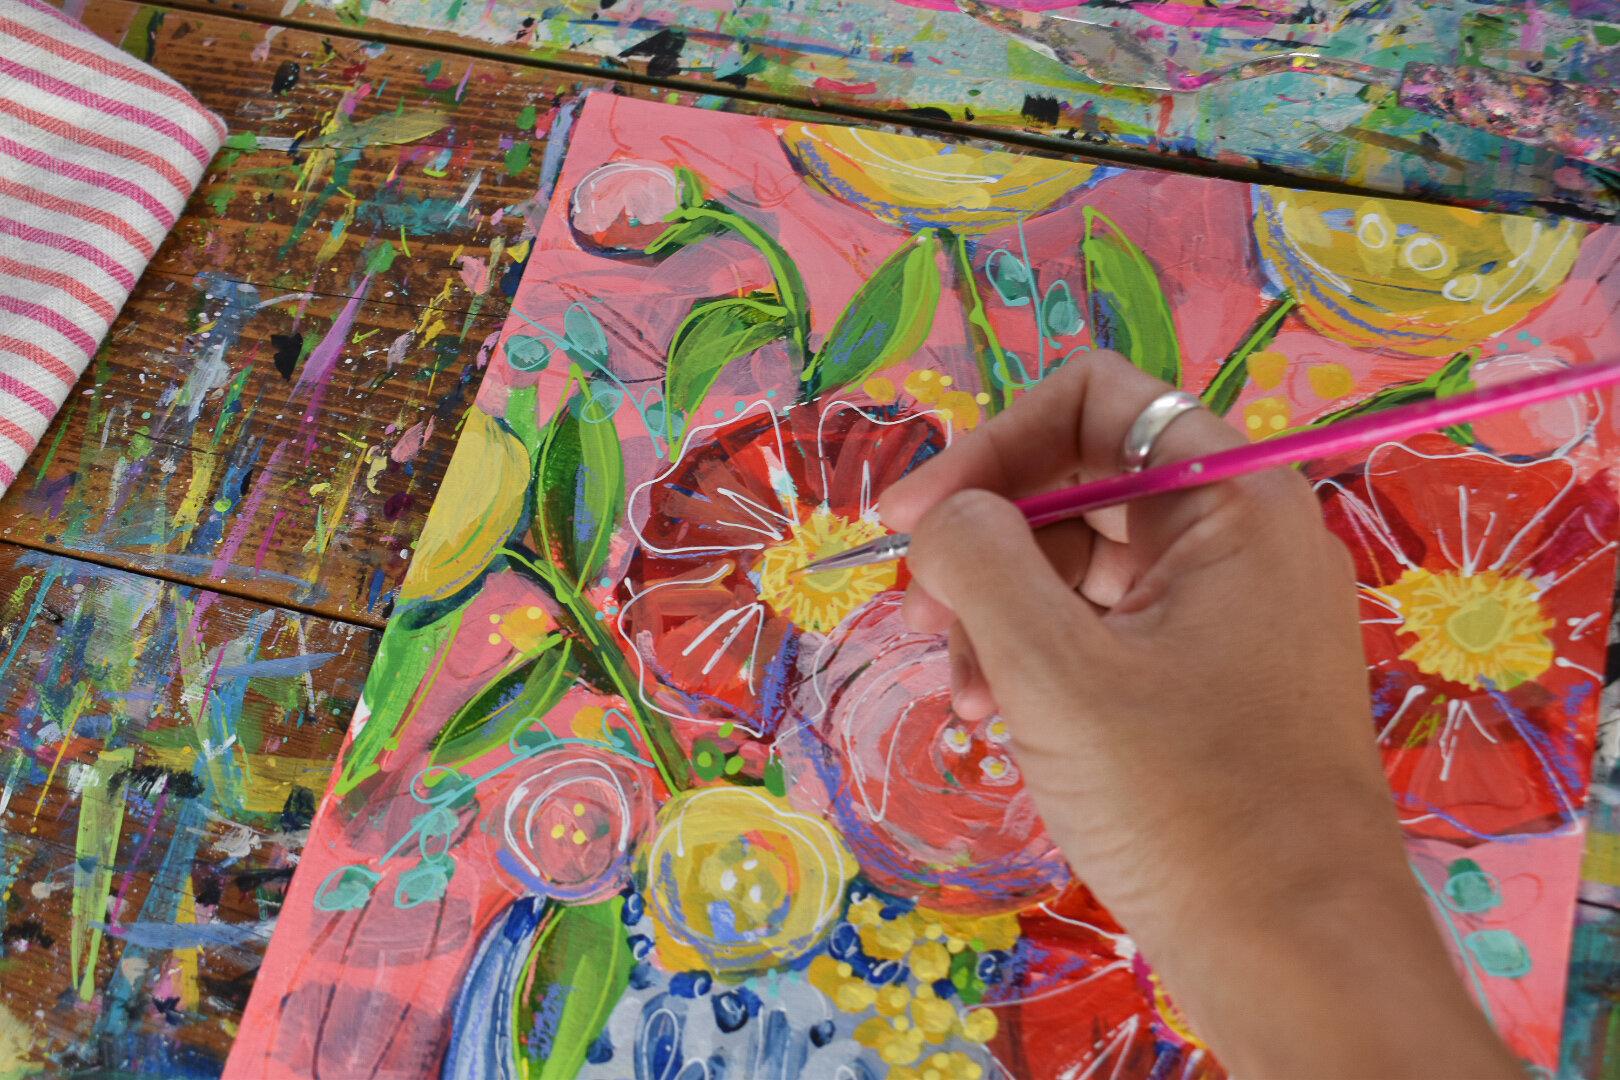 boho_flowers_painting_eclectic_art_chinoserie_daisyfaithart_5.jpg